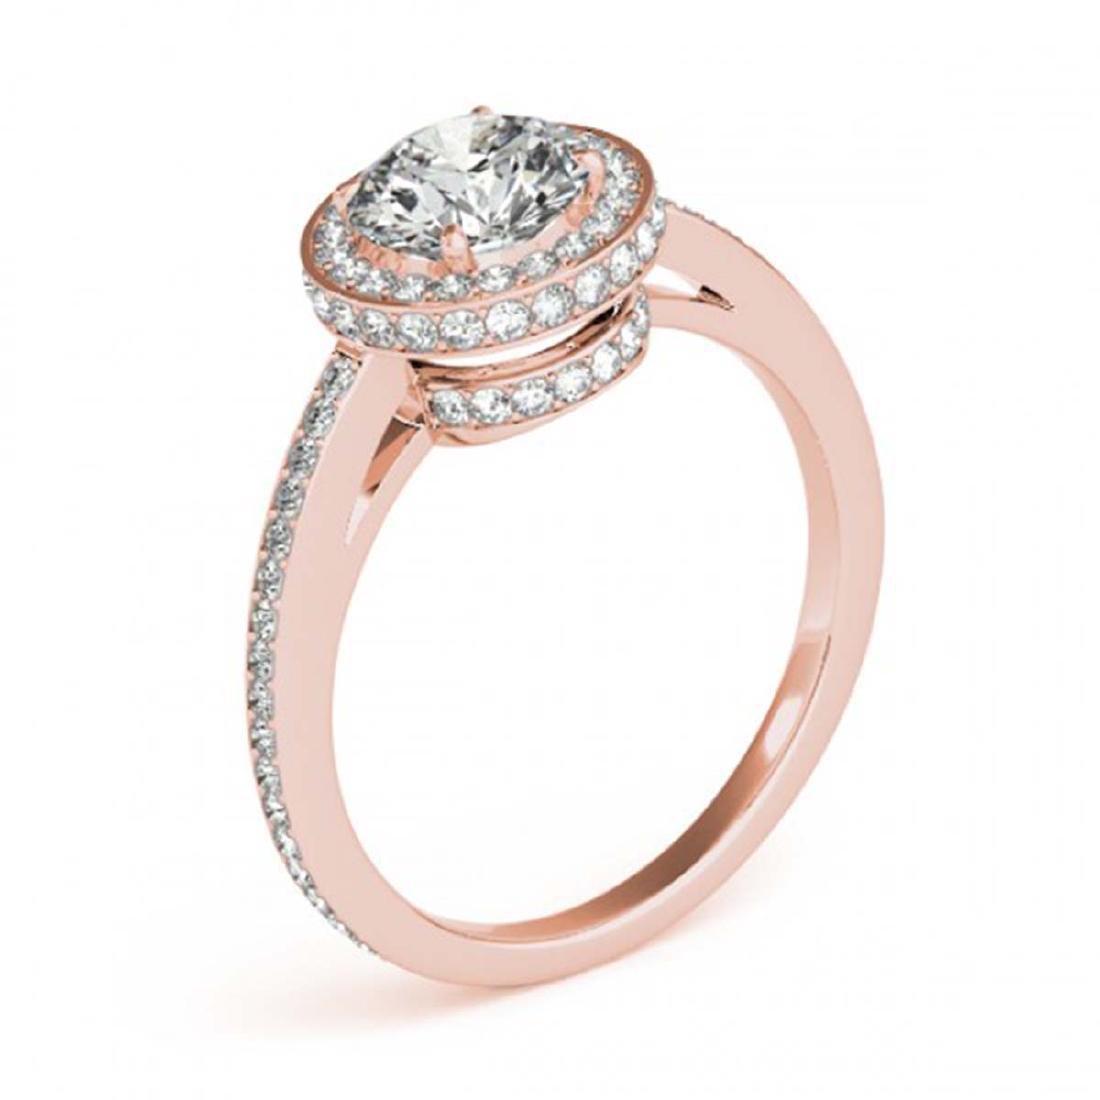 1.25 ctw VS/SI Diamond Solitaire Halo Ring 14K Rose - 3